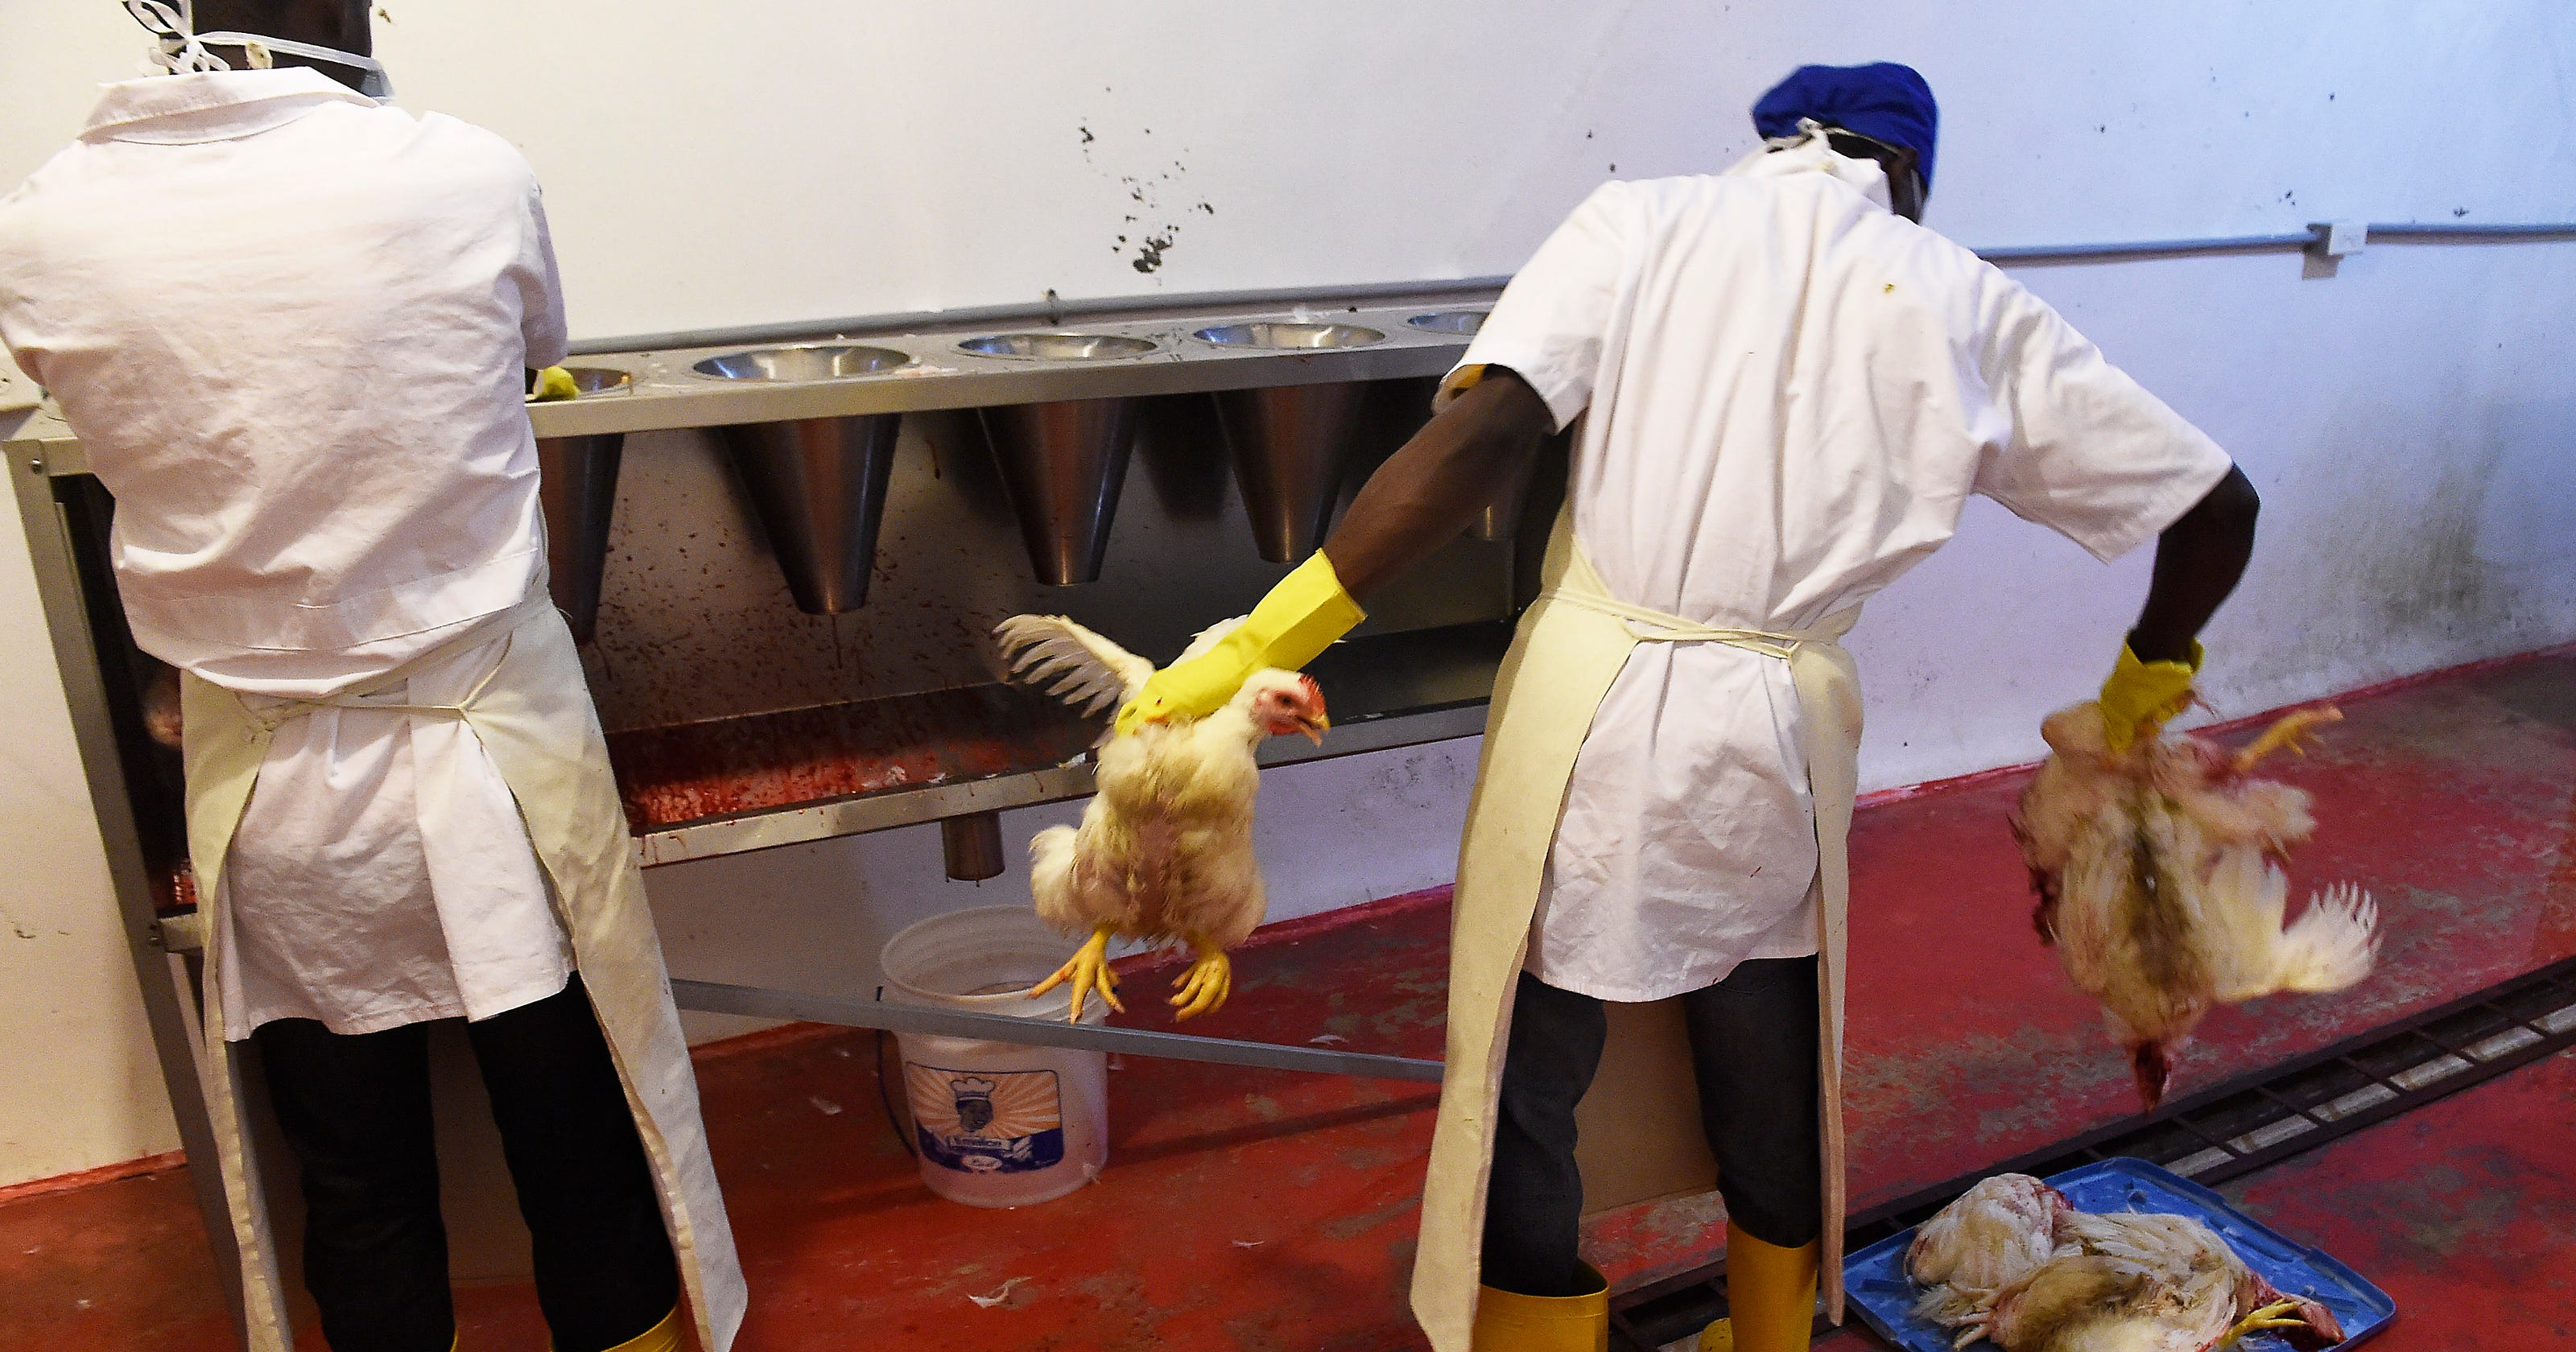 Chicken farming brightens future for Haitians